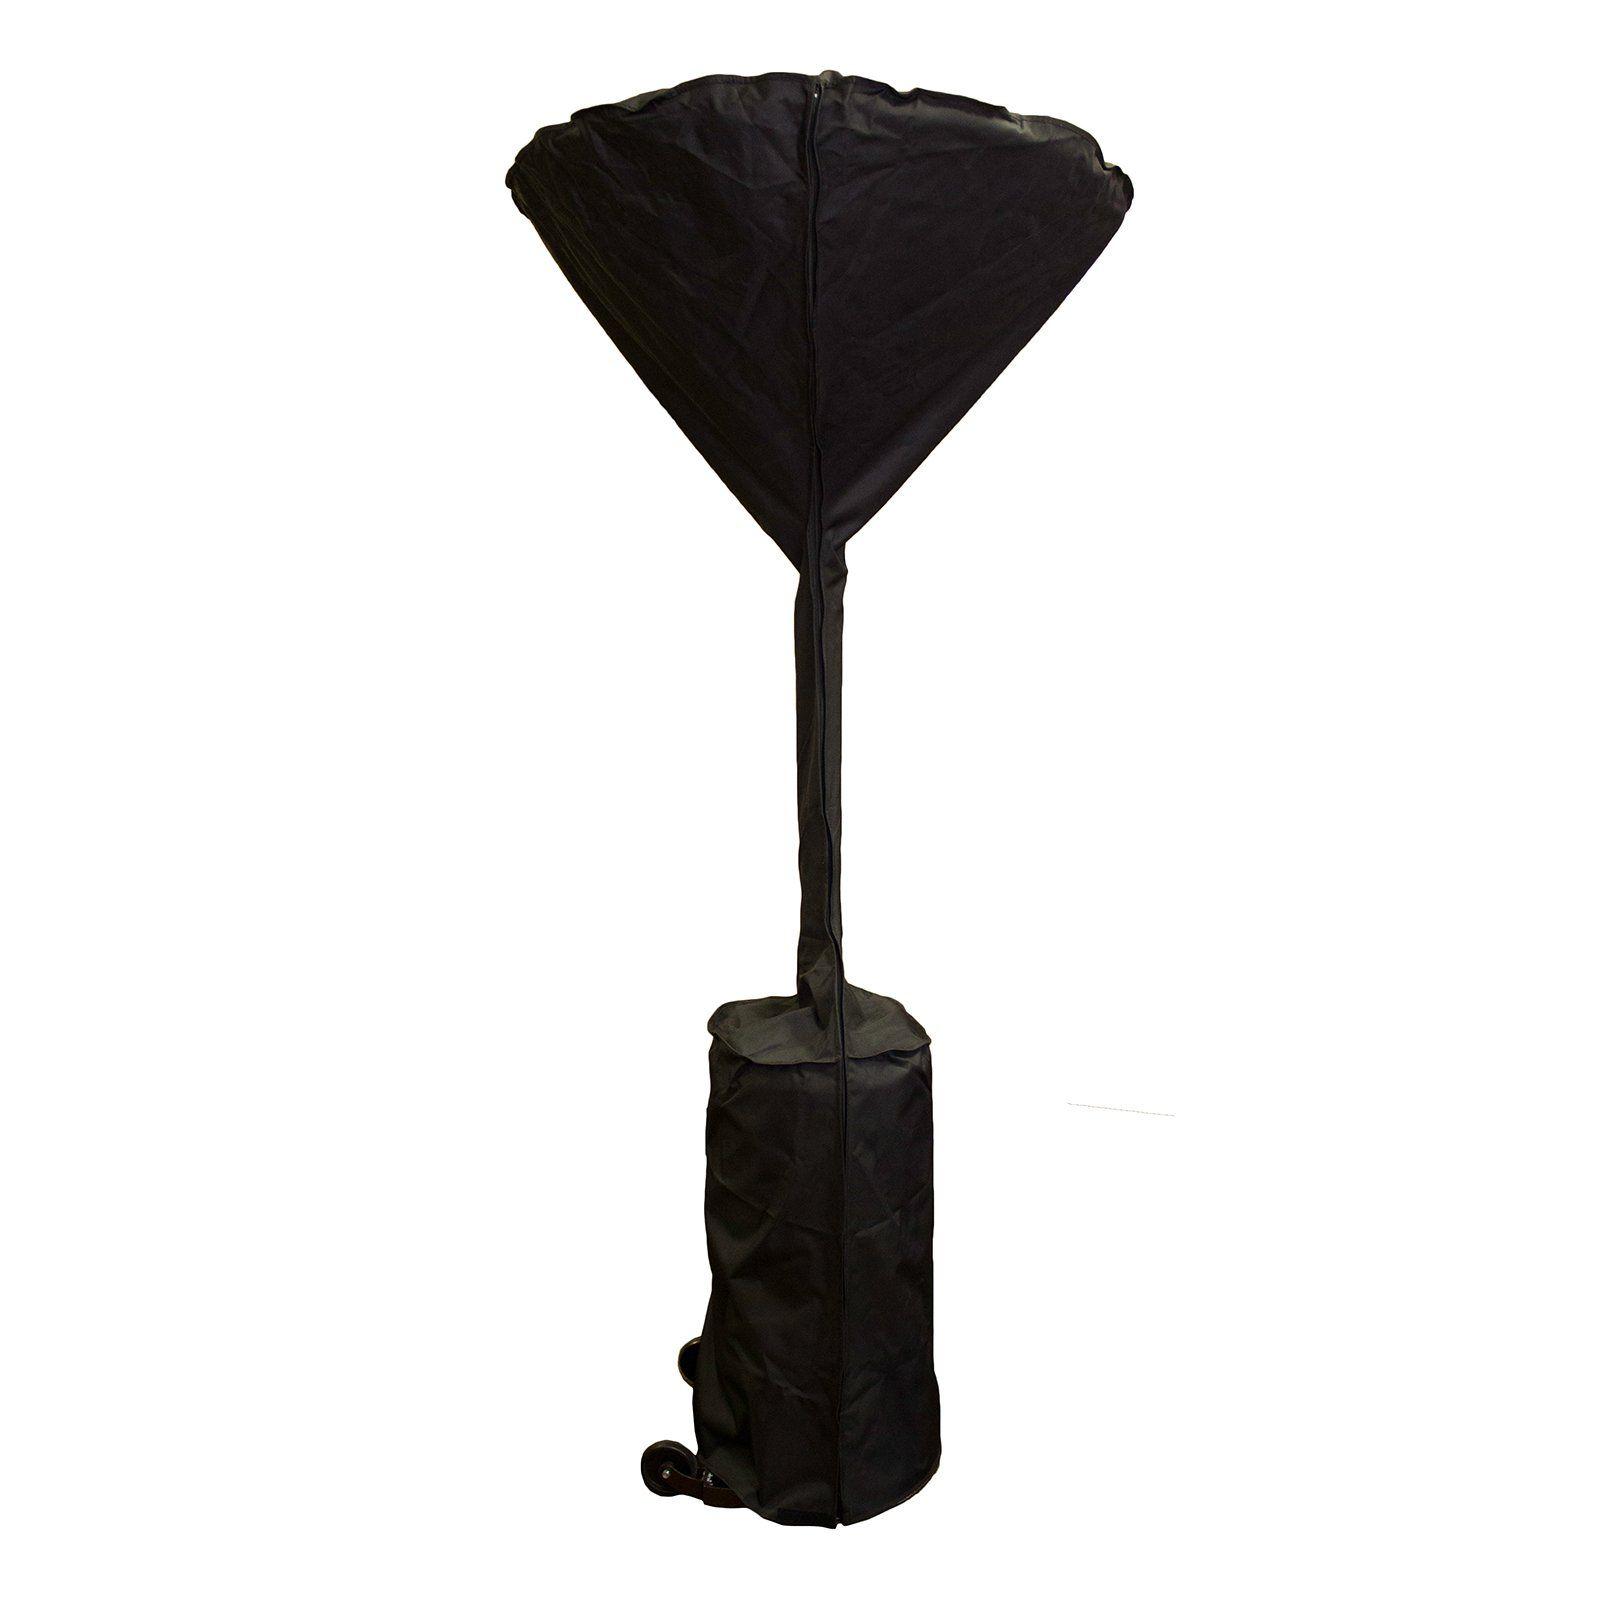 AZ Patio mercial Patio Heater Cover in Black HLB CVR